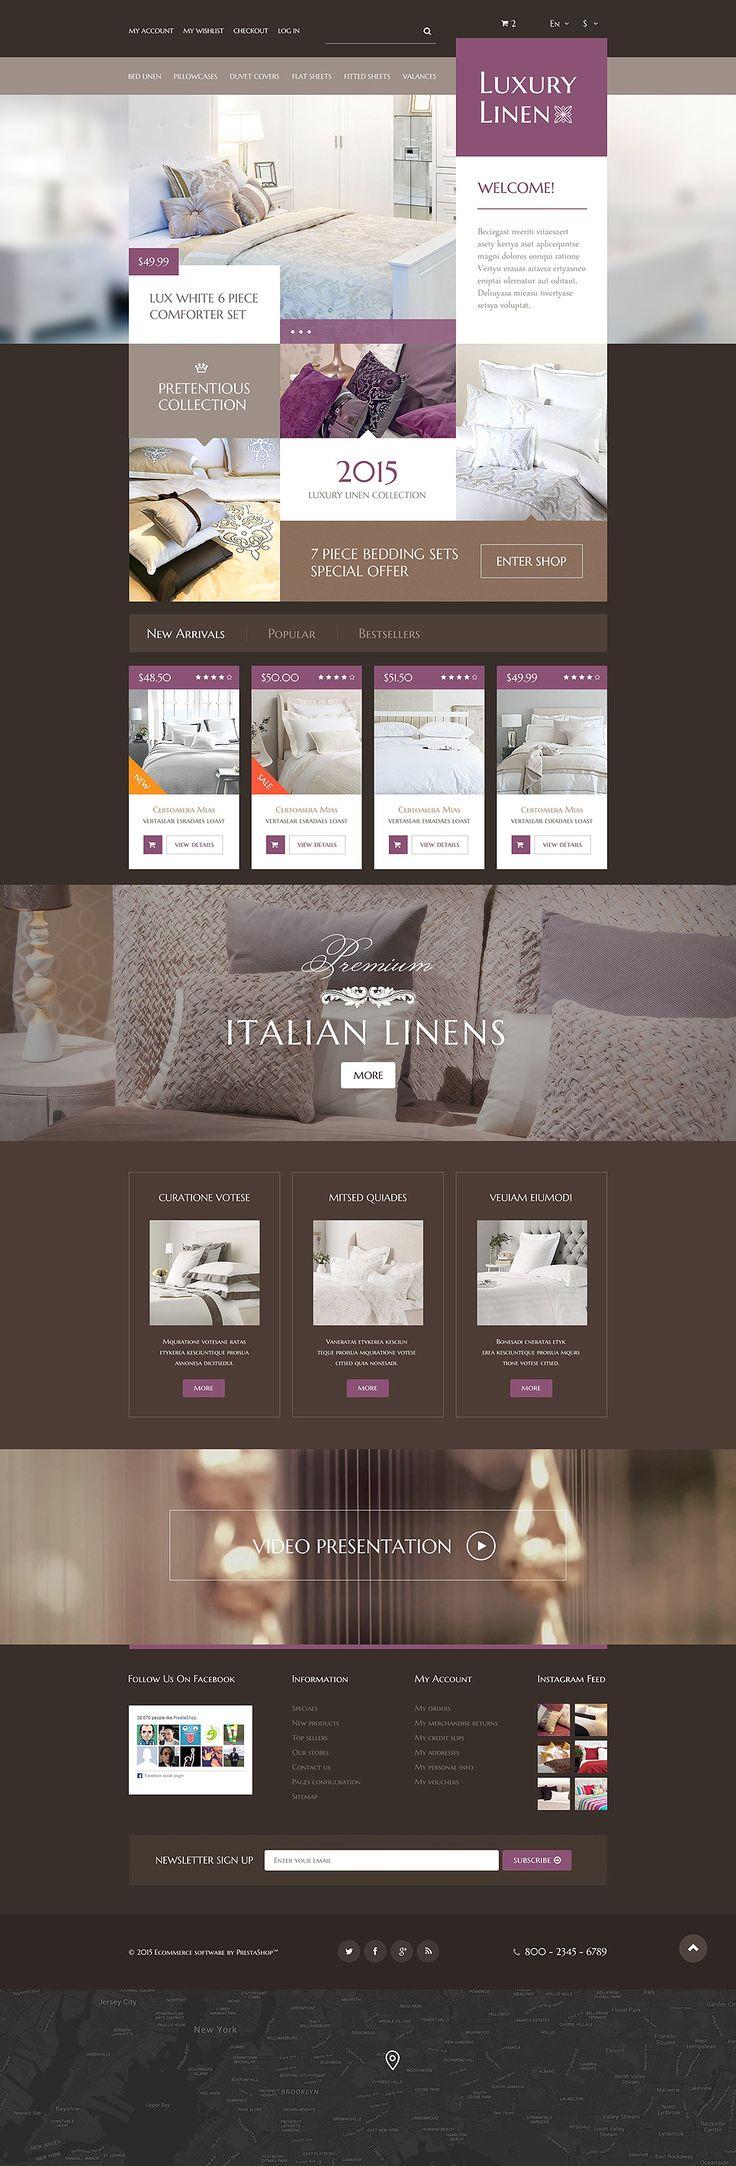 Luxury Linen Store #PrestaShop #Responsive Theme #html5 #css3 #bootstrap ready ...  pic.twitter.com/A7X3HijImQ